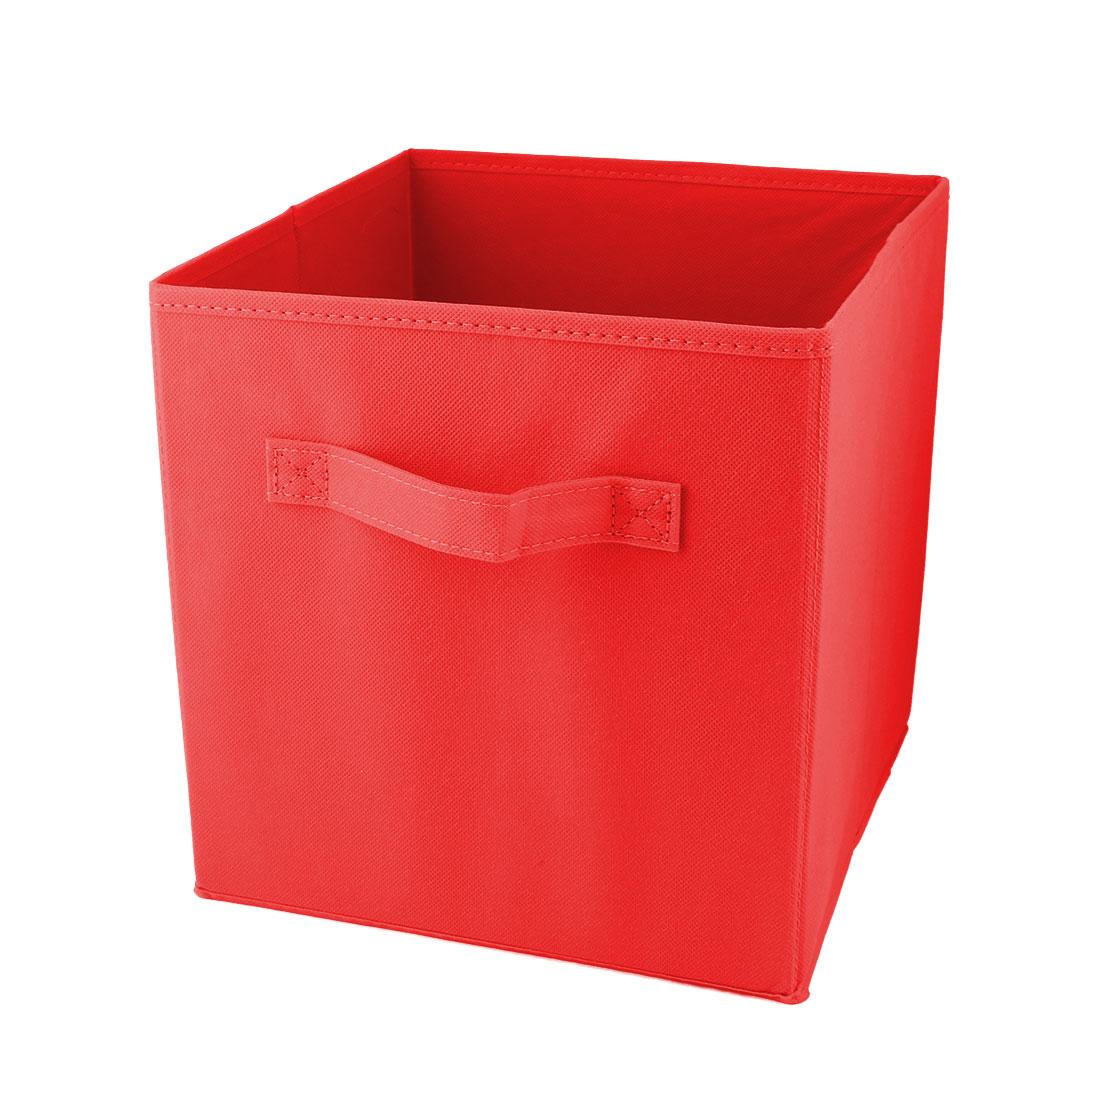 Apartment Non-woven Fabric Foldable Books Cosmetics Holder Storage Box Red